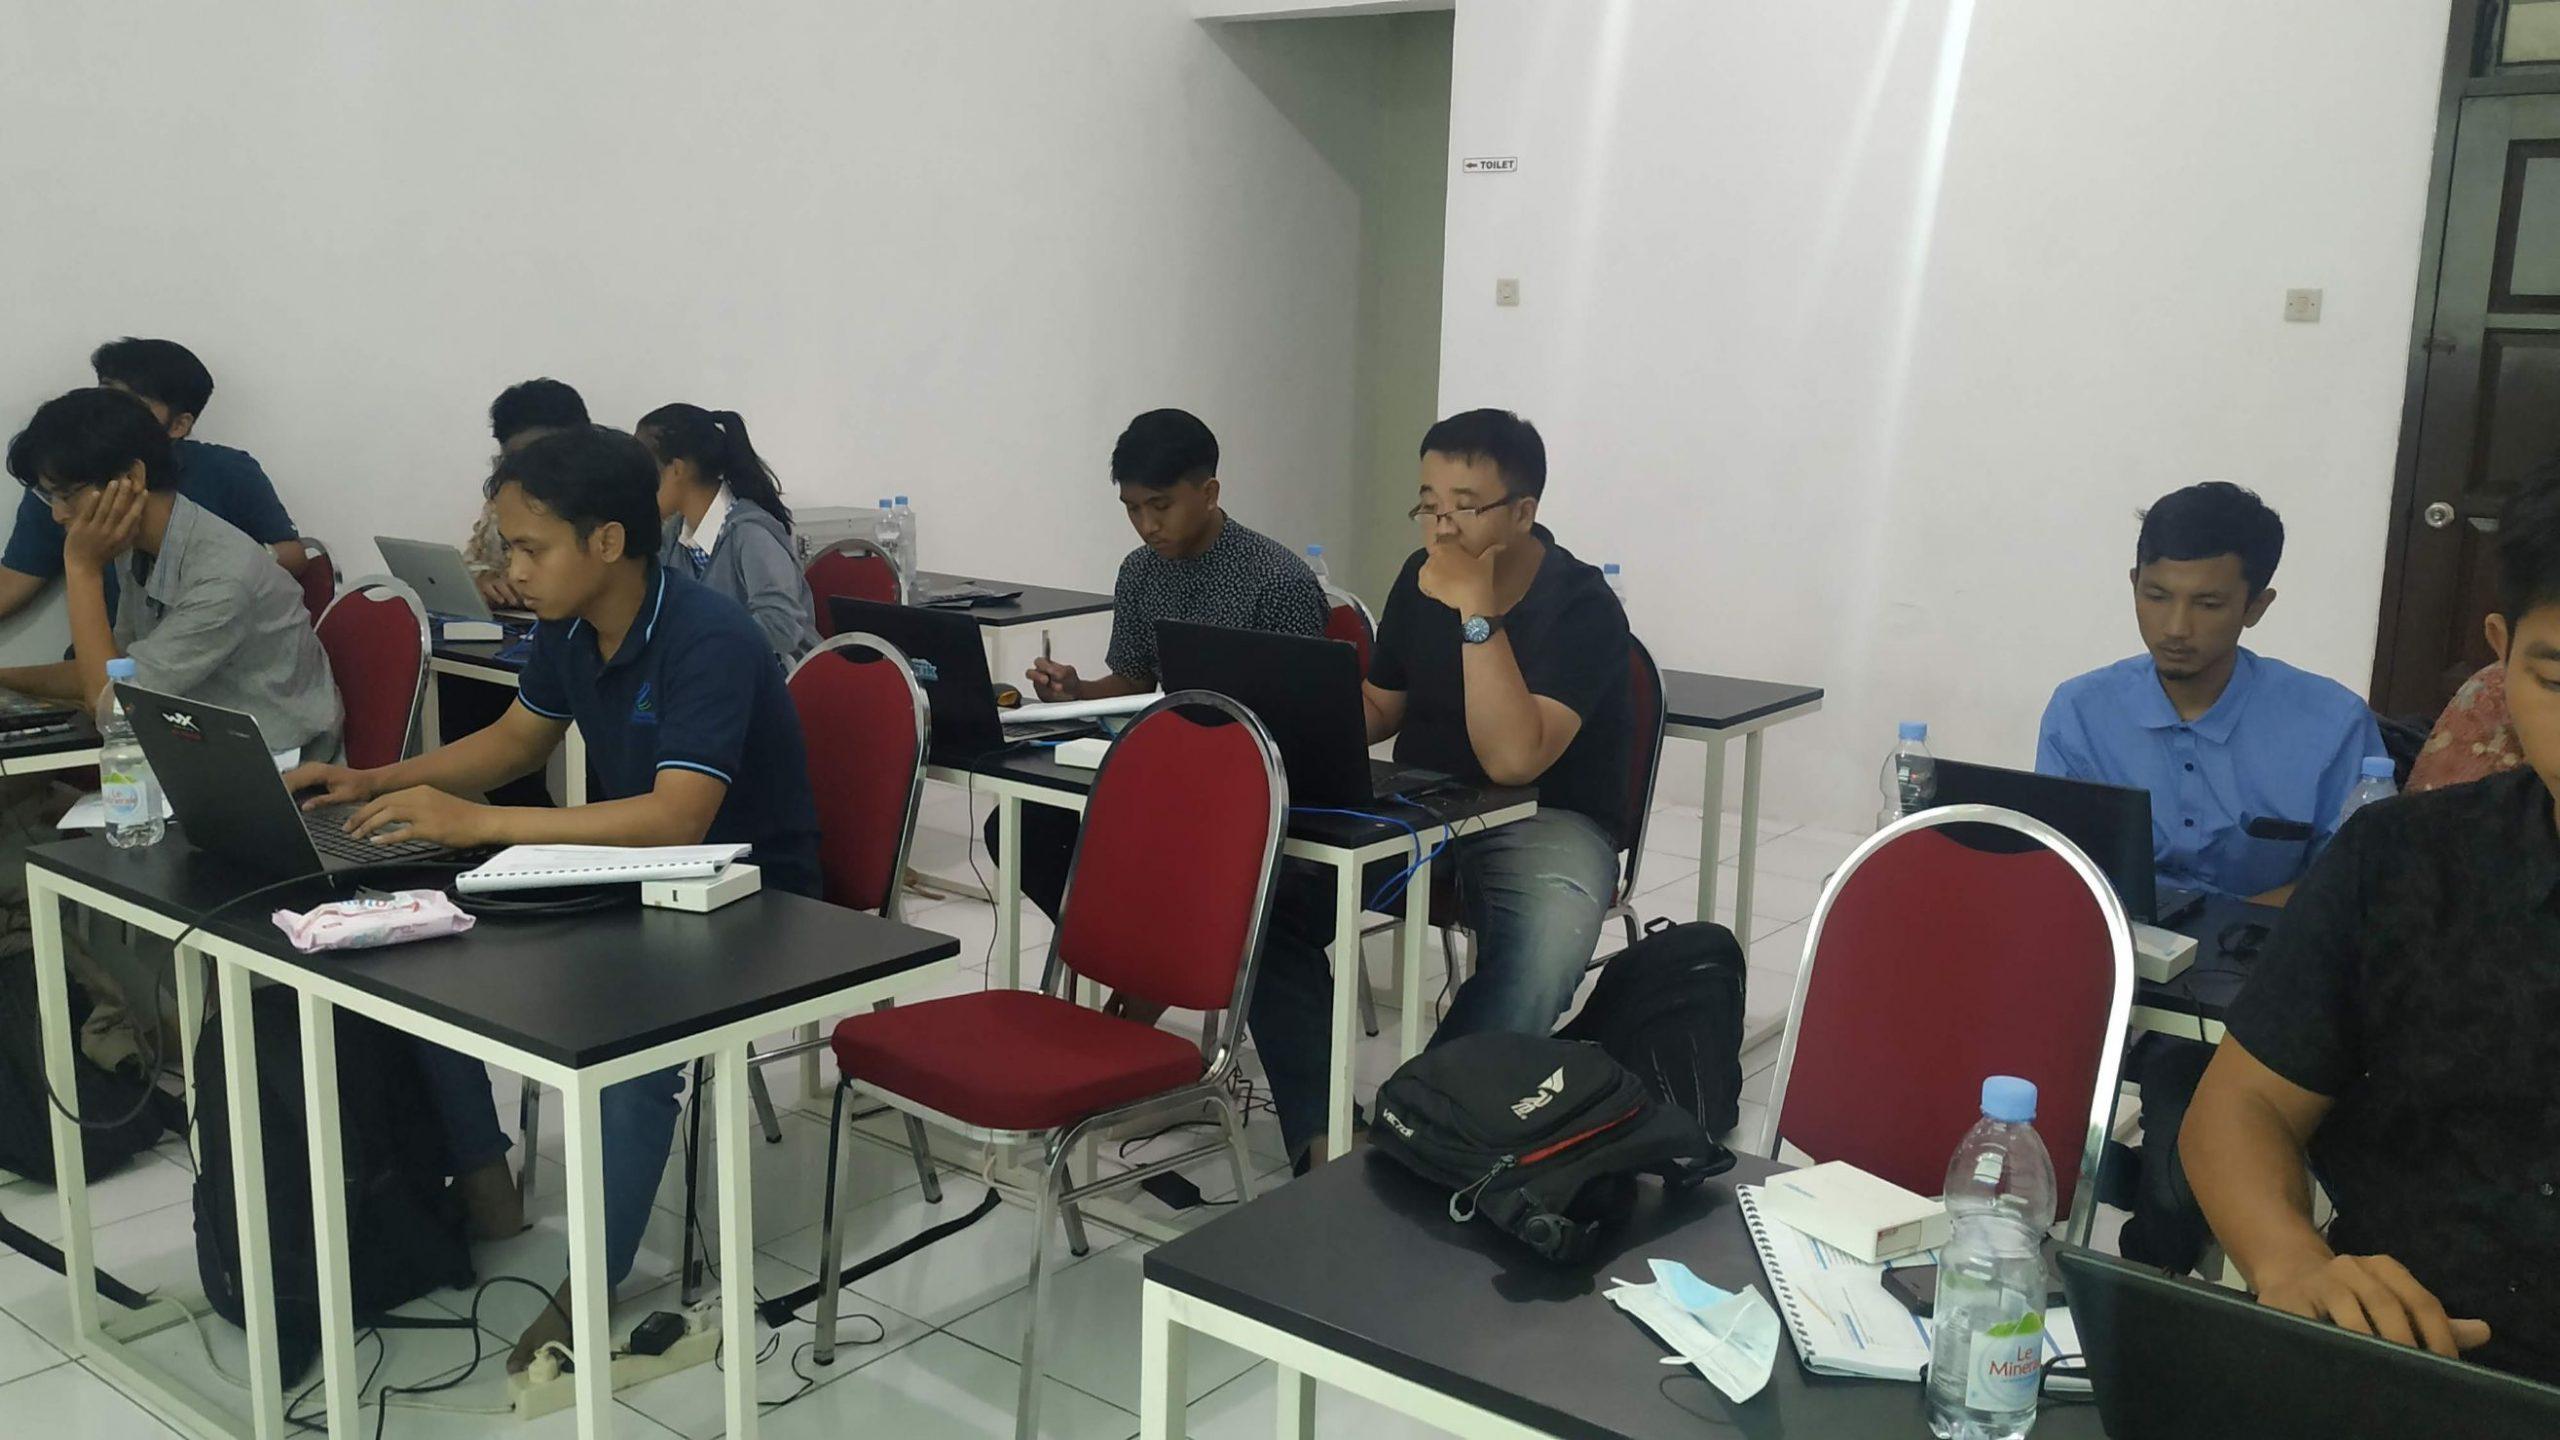 belajar, mikrotik, sertifikasi, training, IMG_20190411_135439